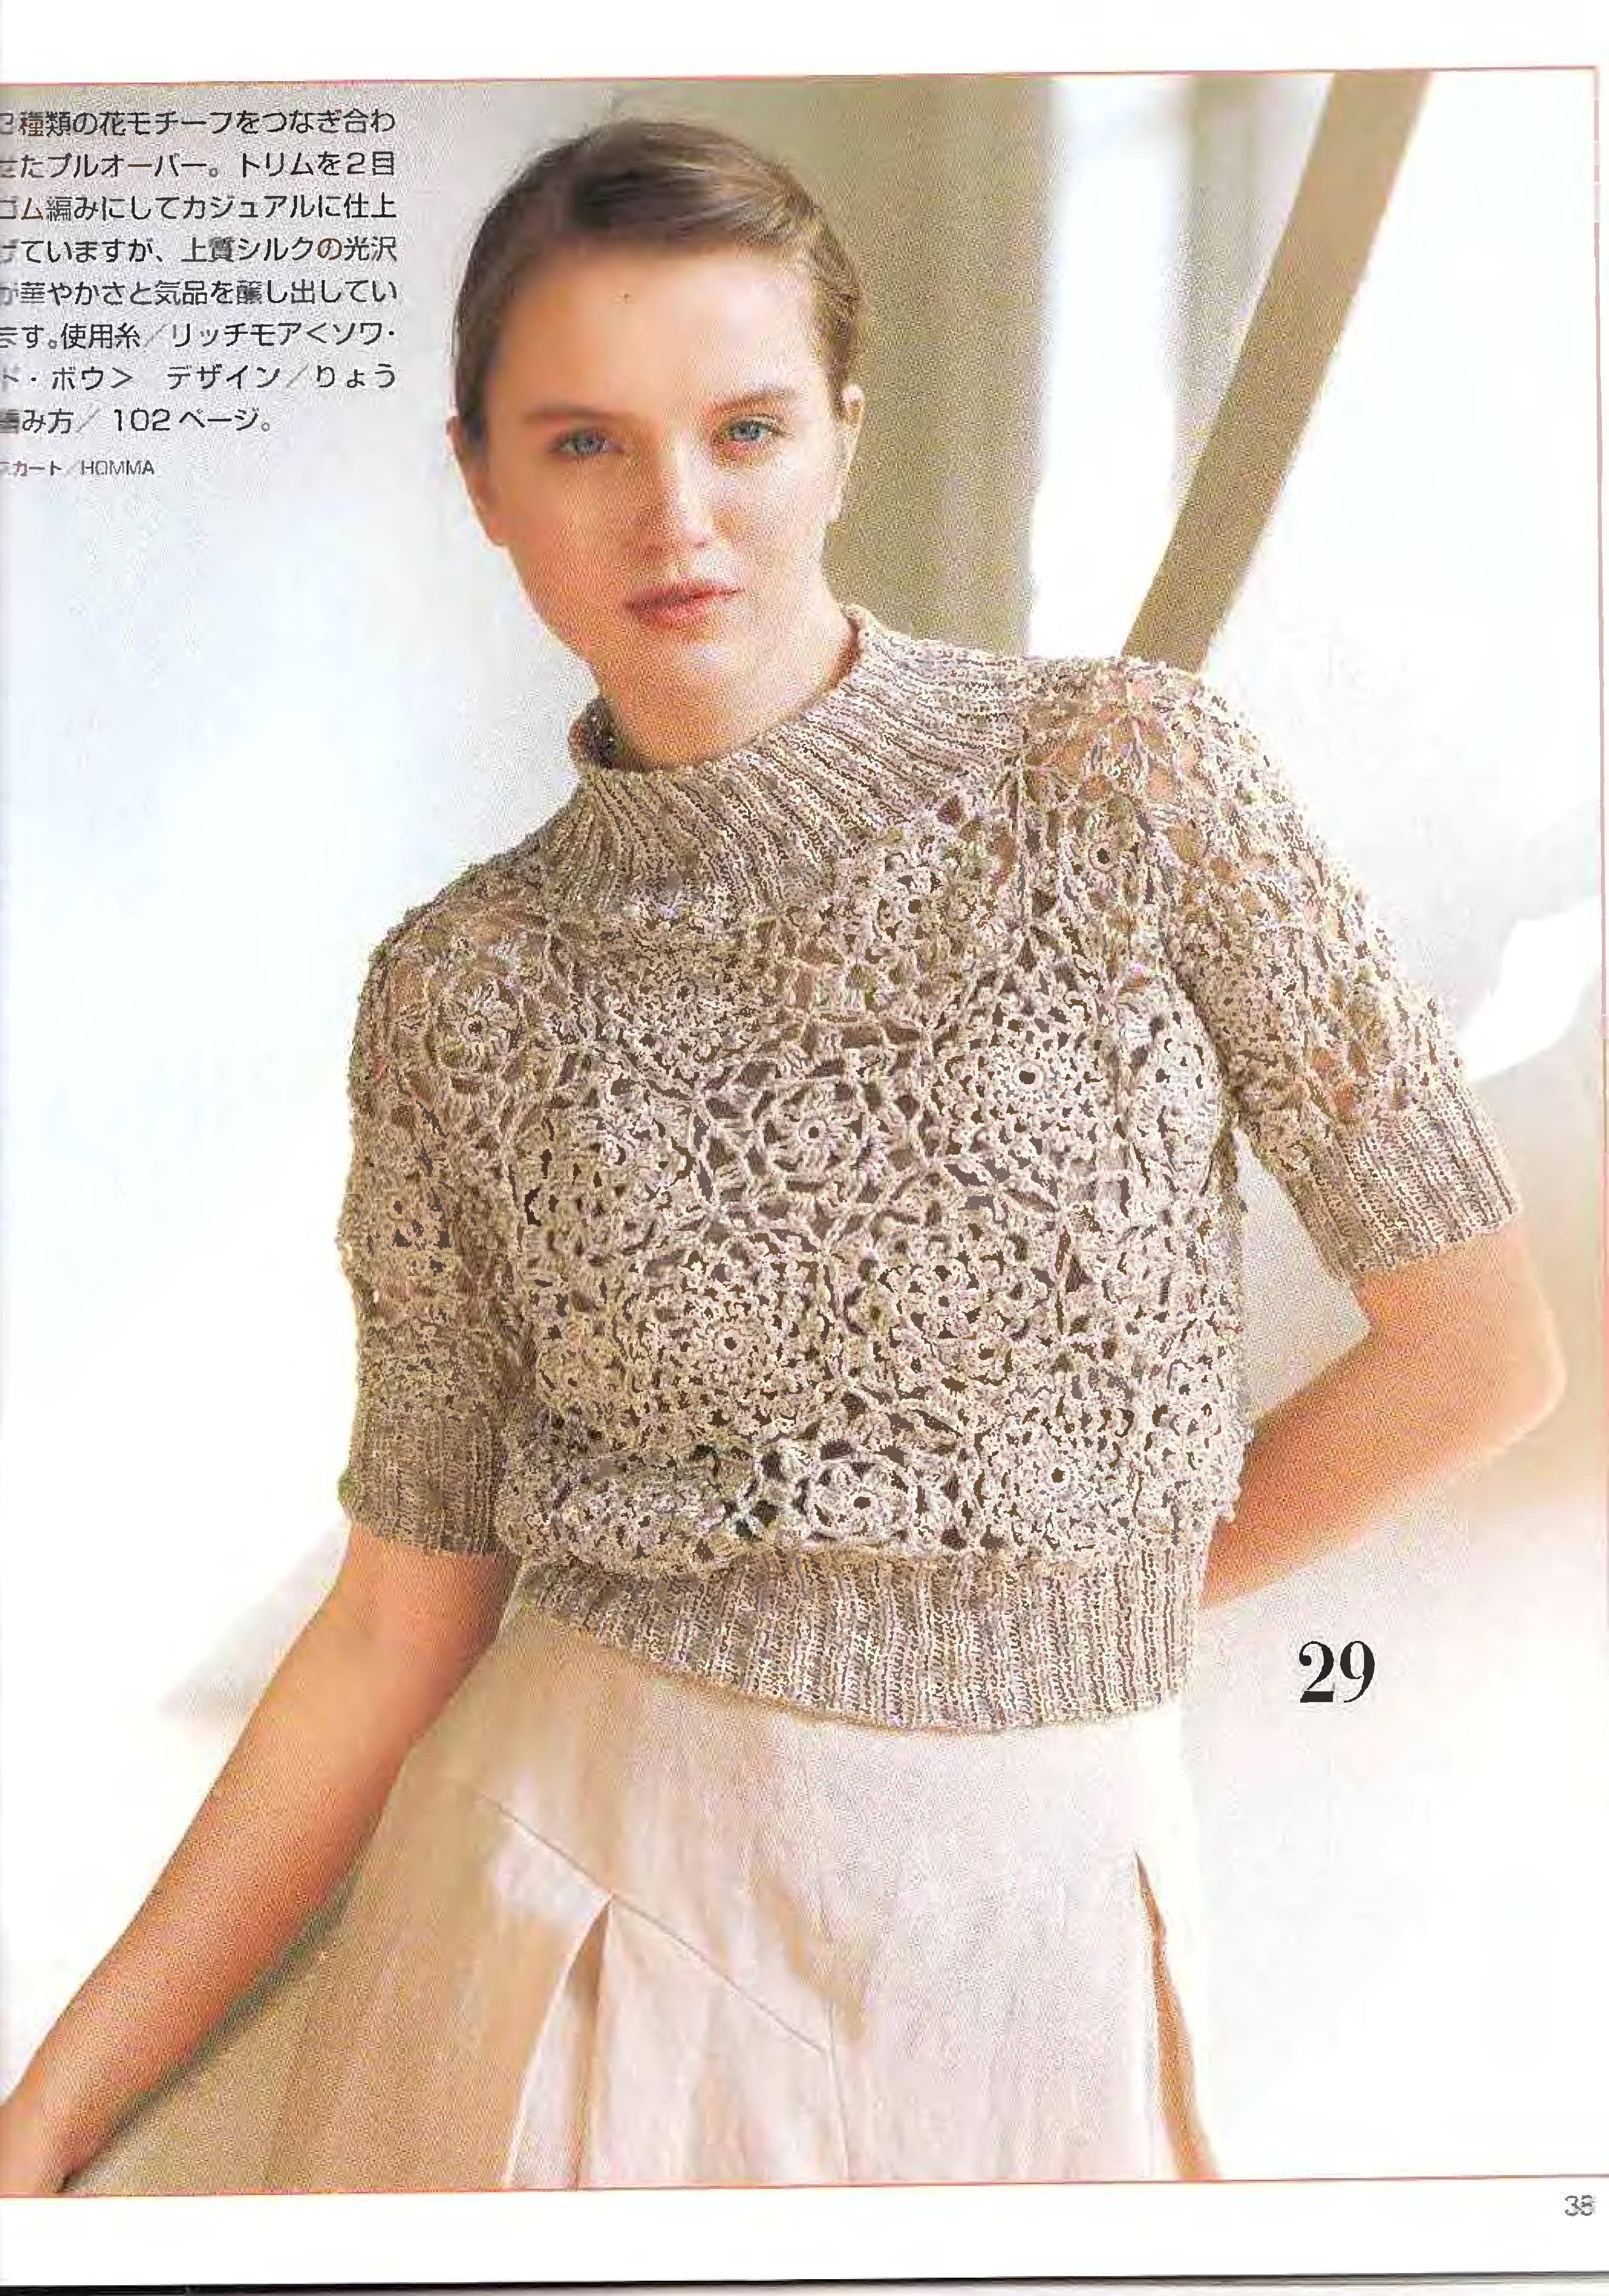 Lets-knit-series-NV4359-2008-Spring-Summer-sp-kr_36.jpg